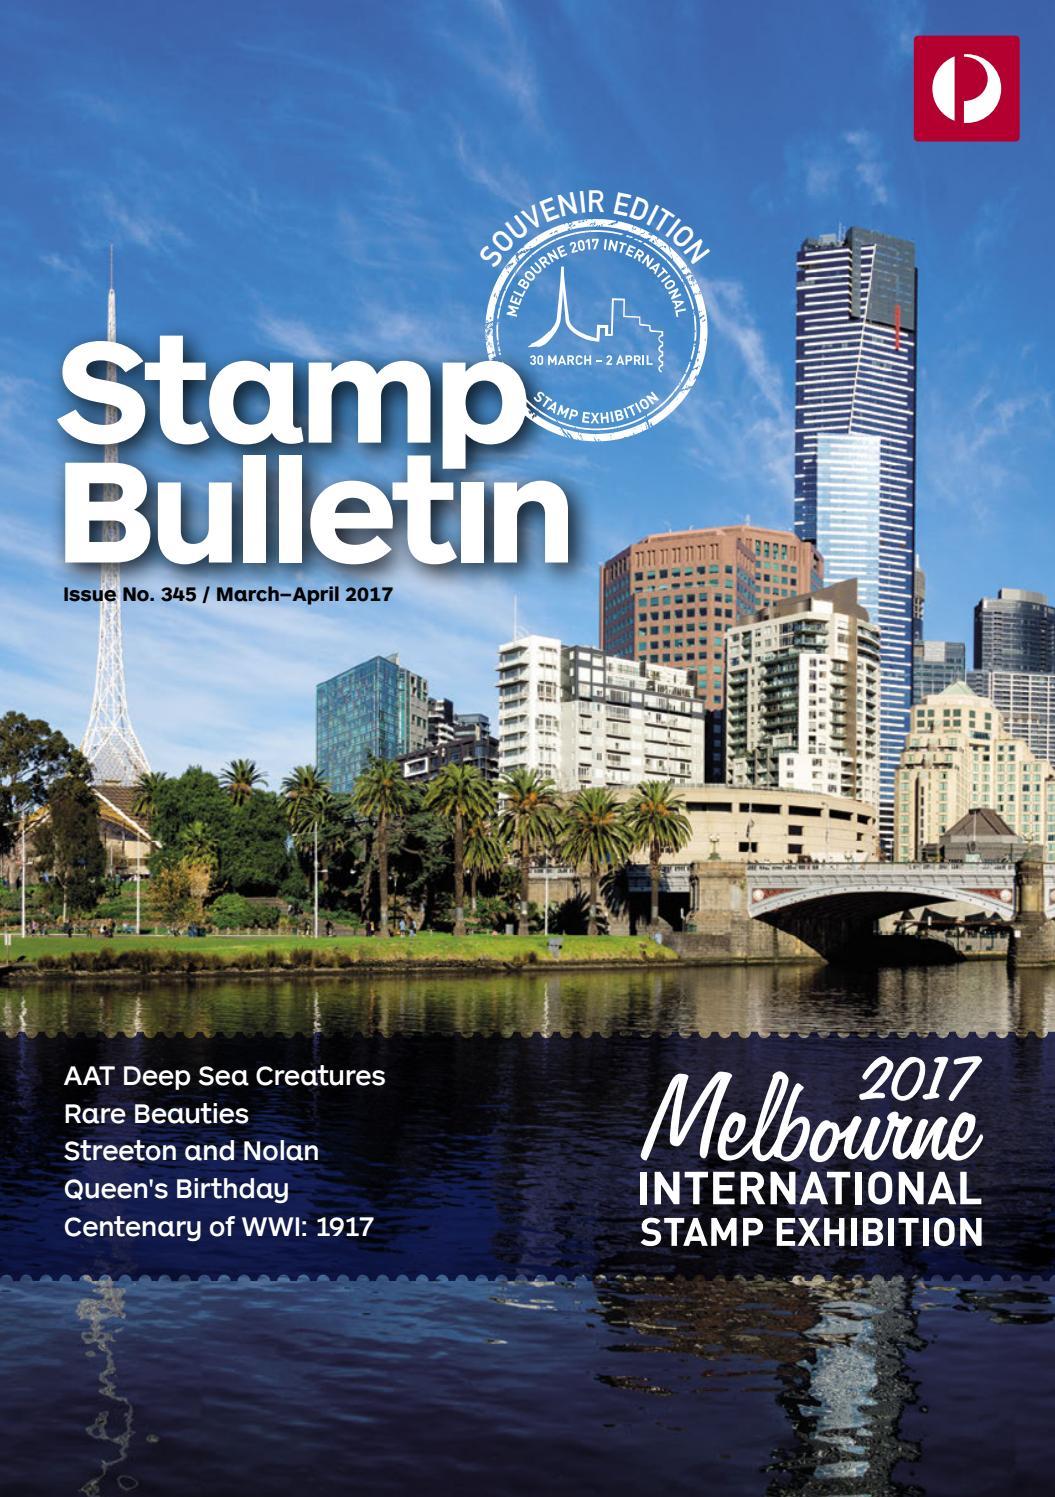 Stamp bulletin 345 by Australia Post - issuu